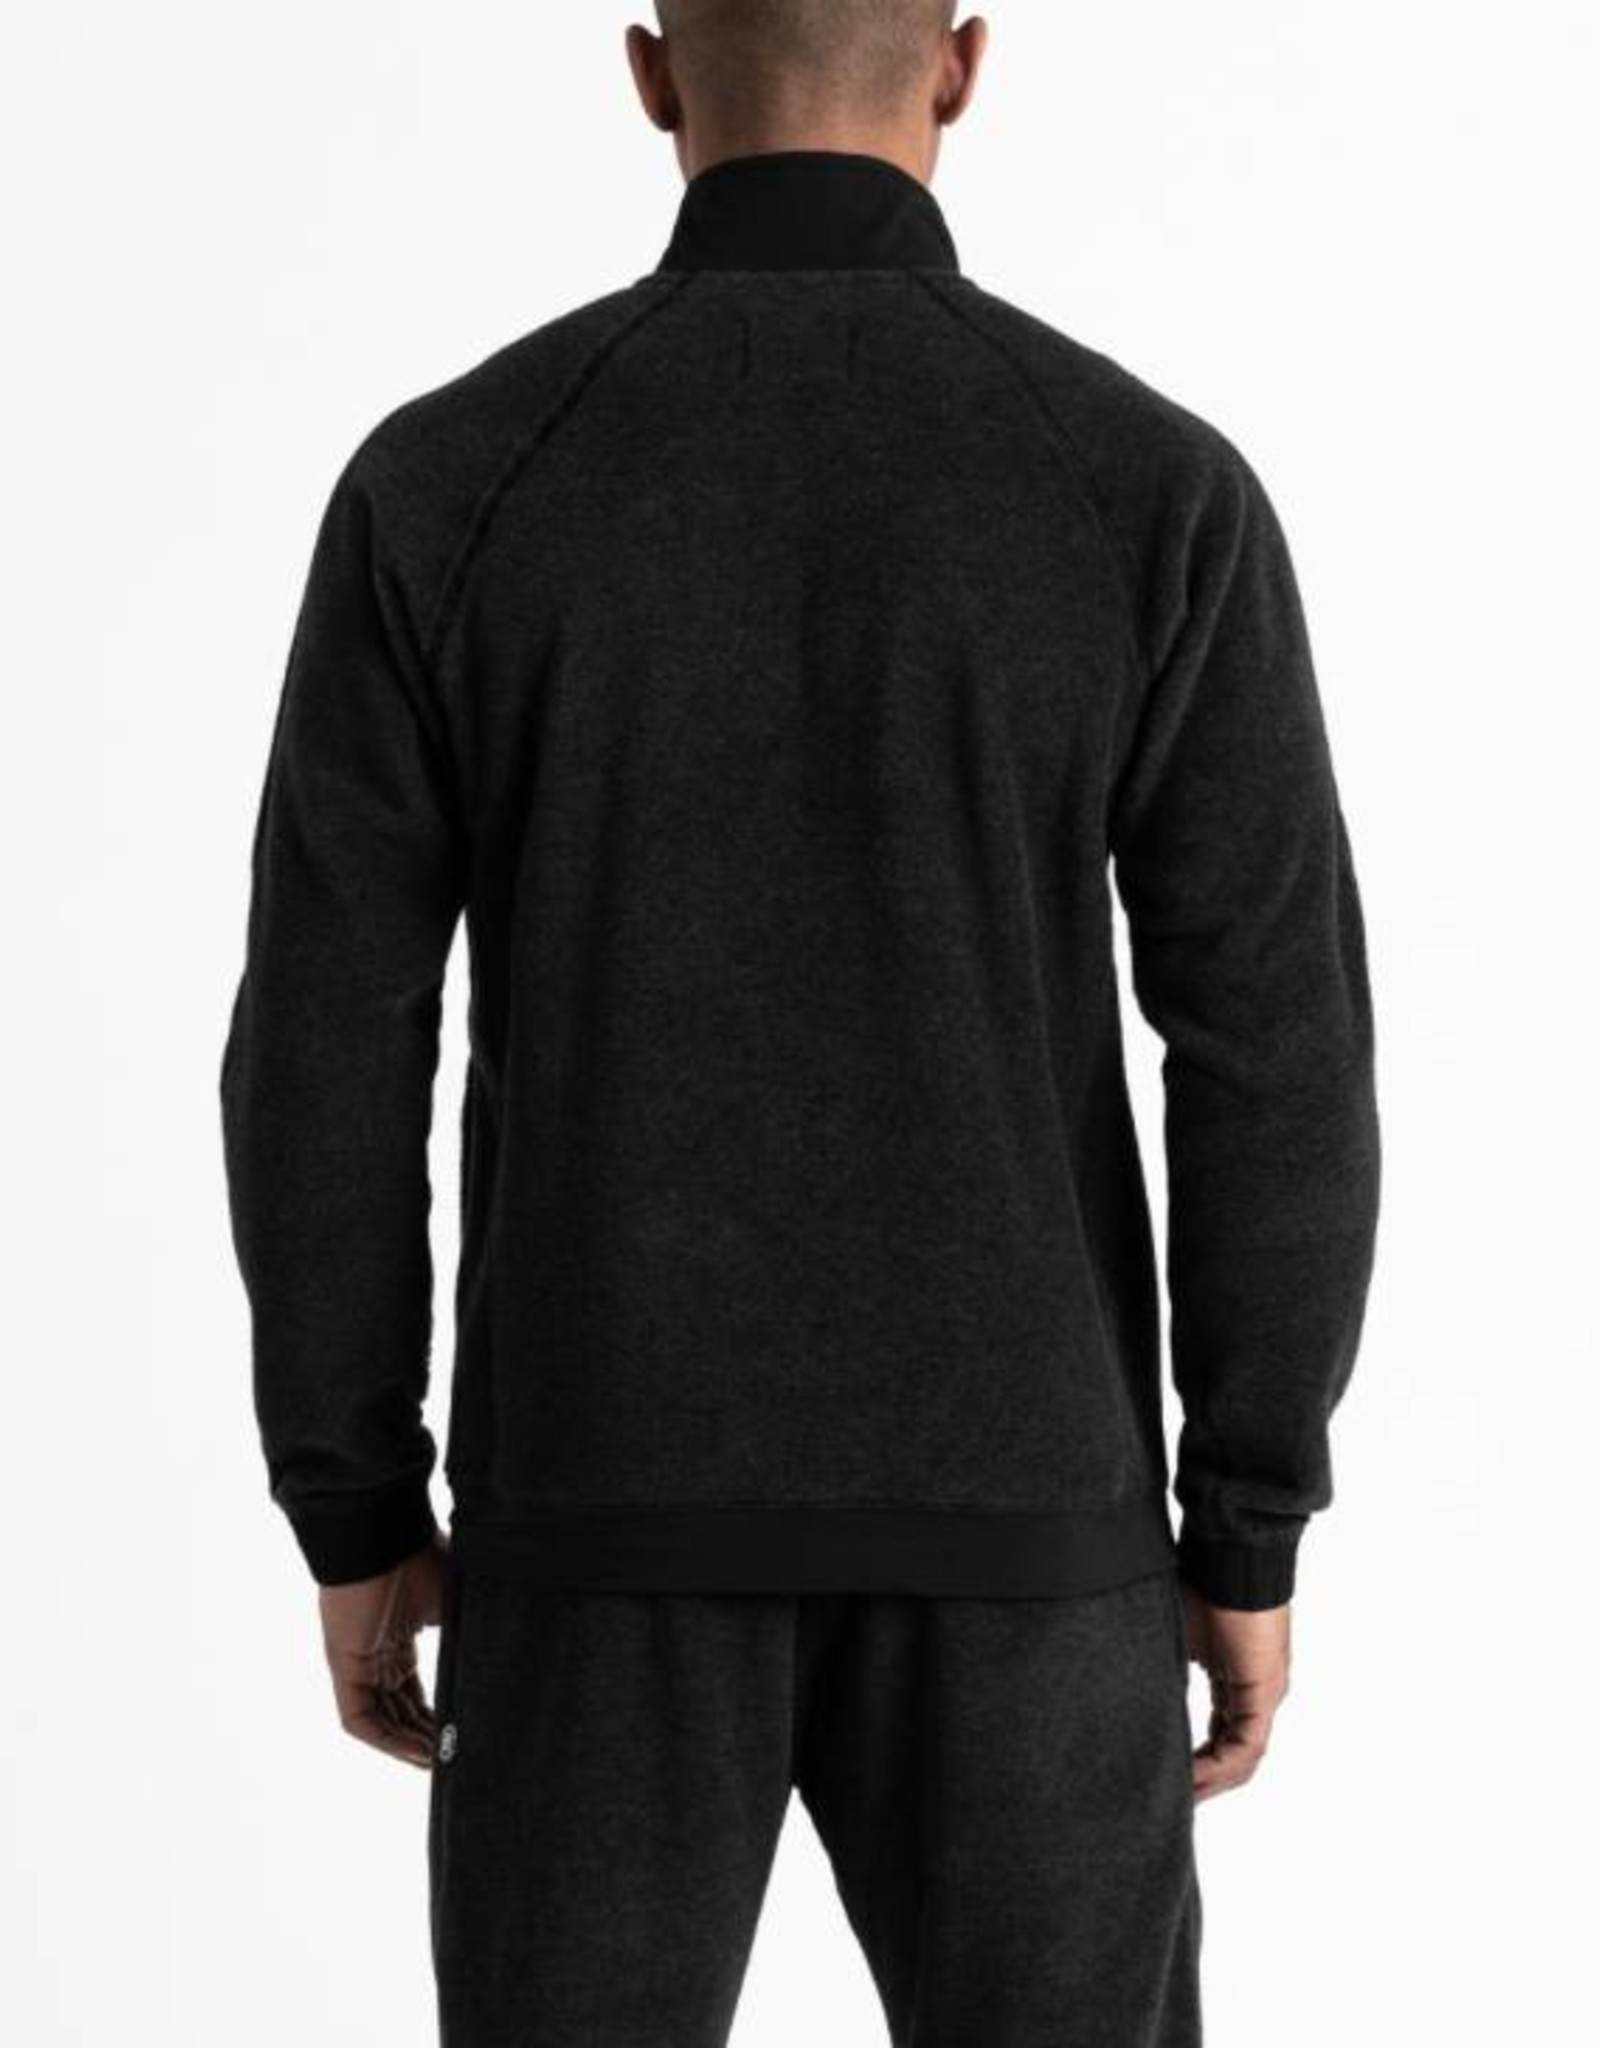 Reigning Champ REIGNING CHAMP Knit Polartec Fleece Half Zip Pullover